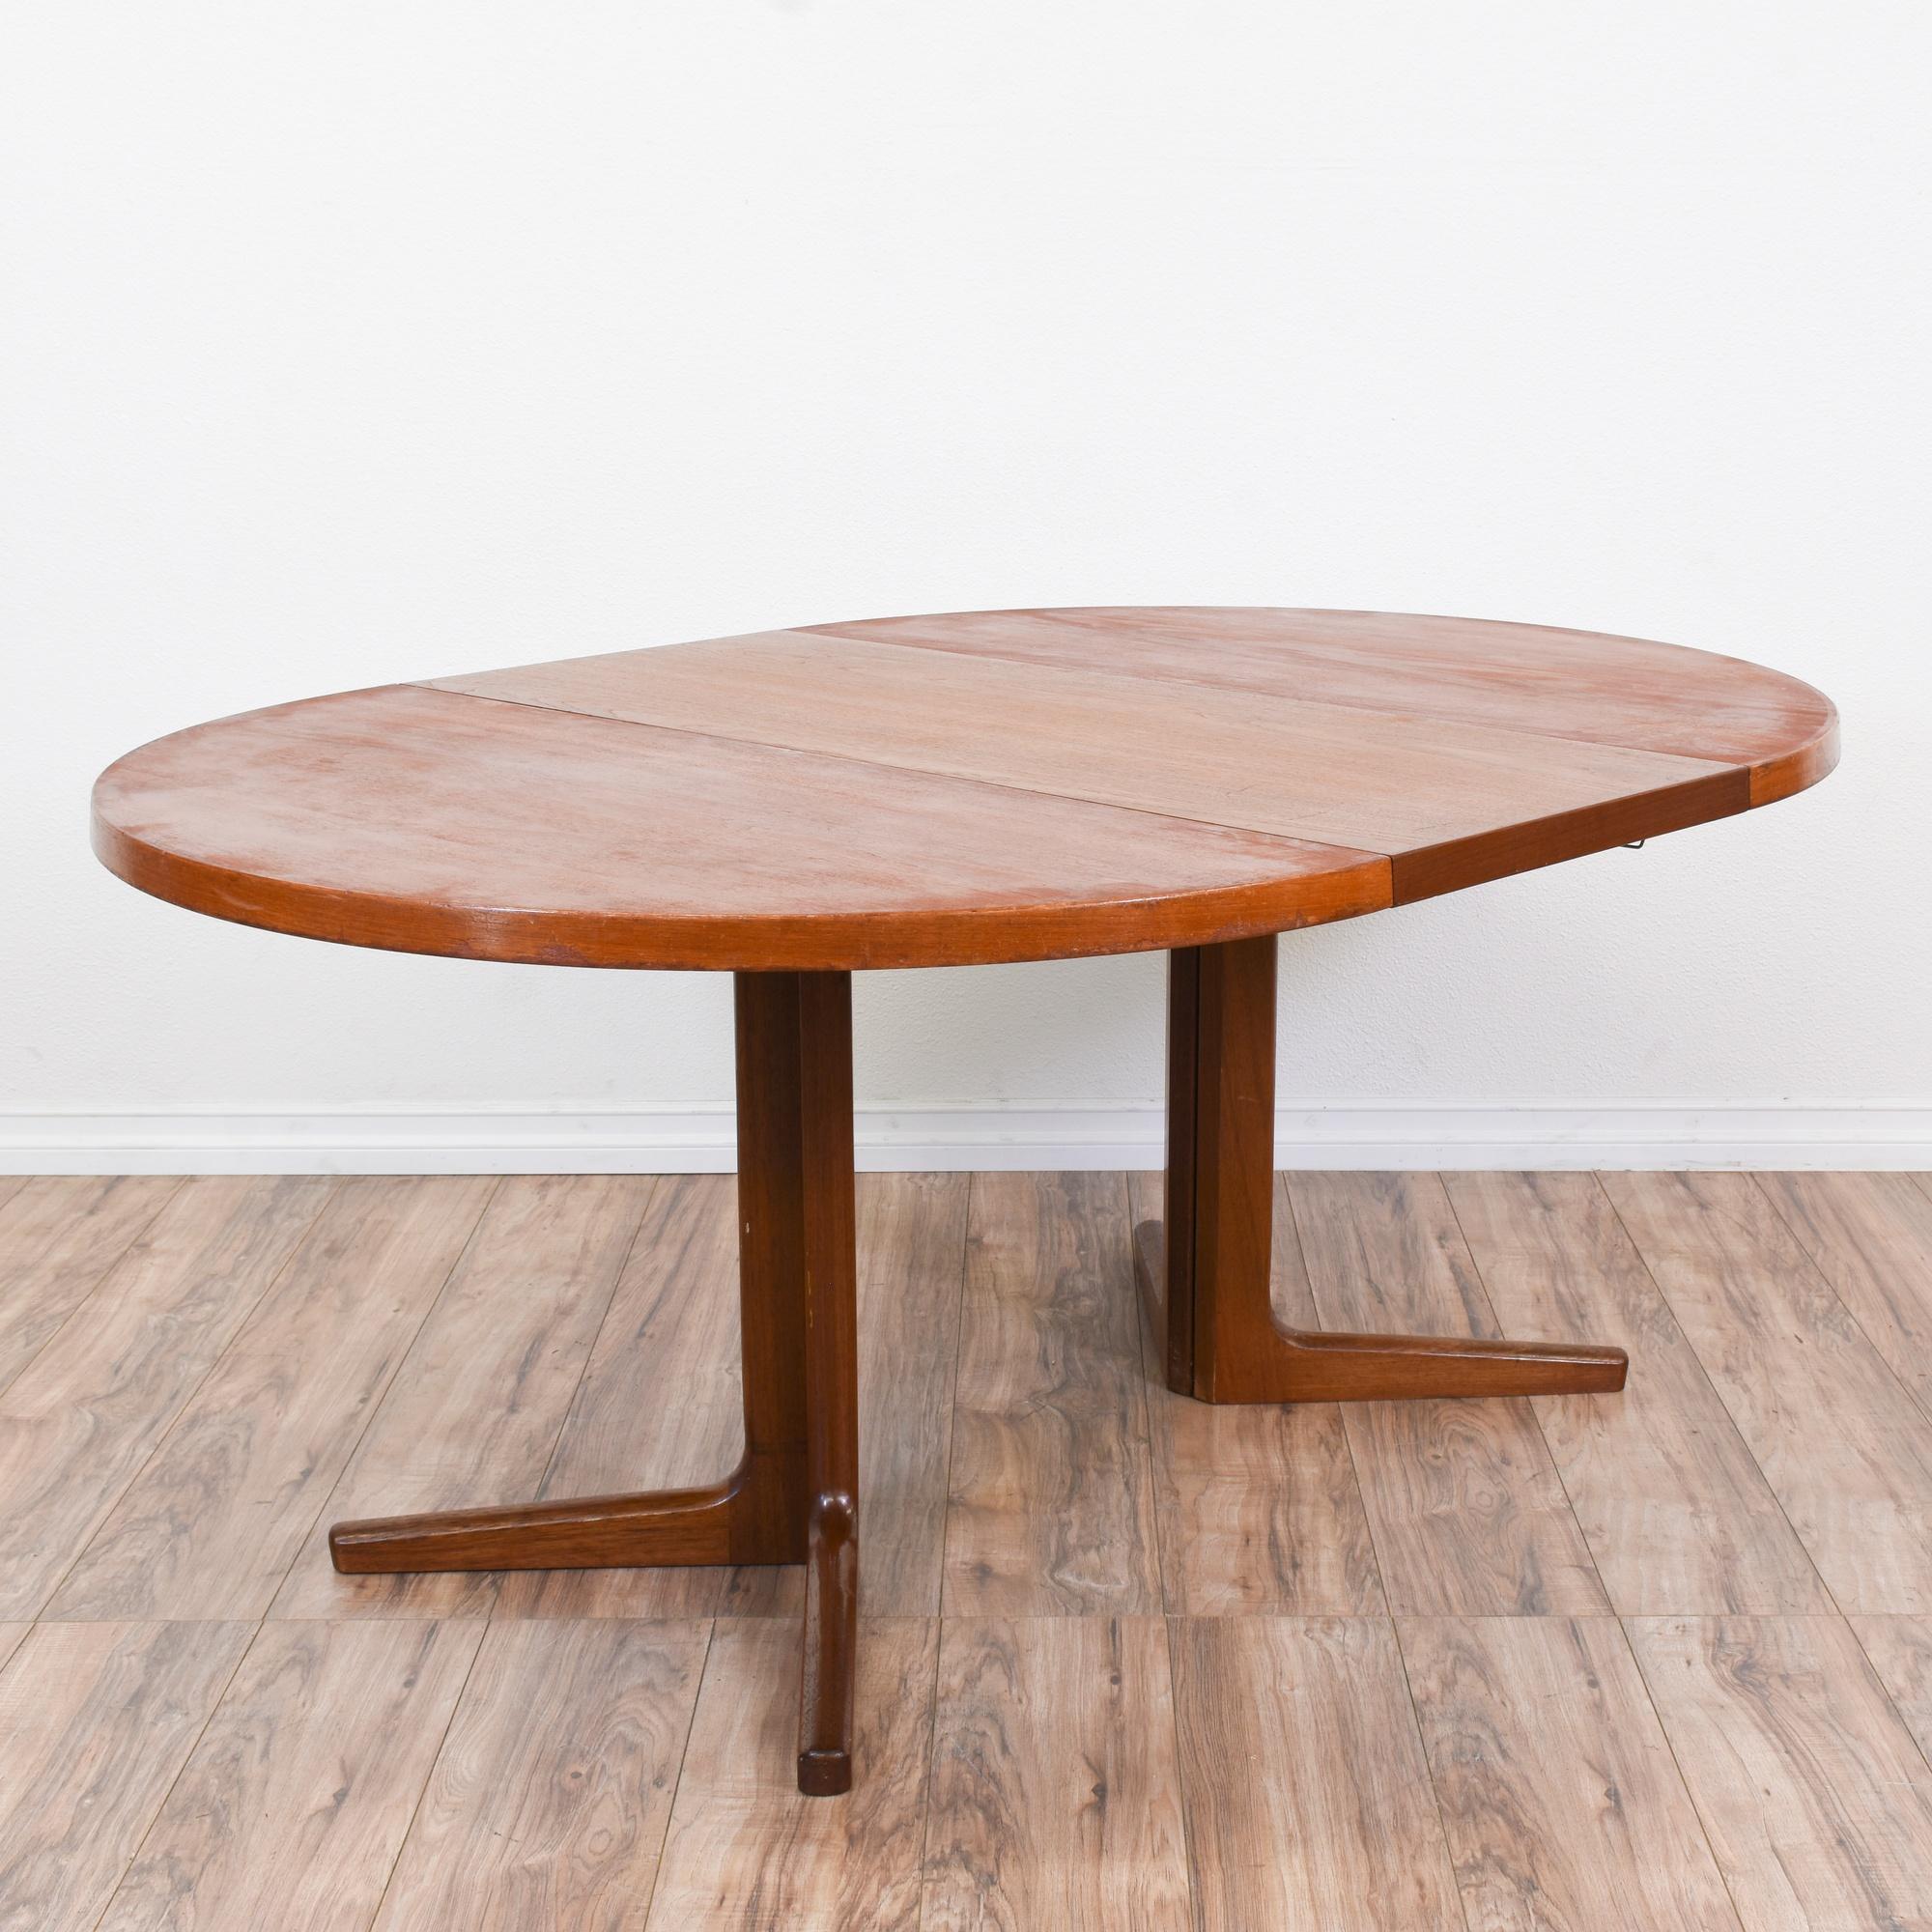 Dining Room Furniture San Diego: Danish Modern Round Dining Table W/1 Leaf